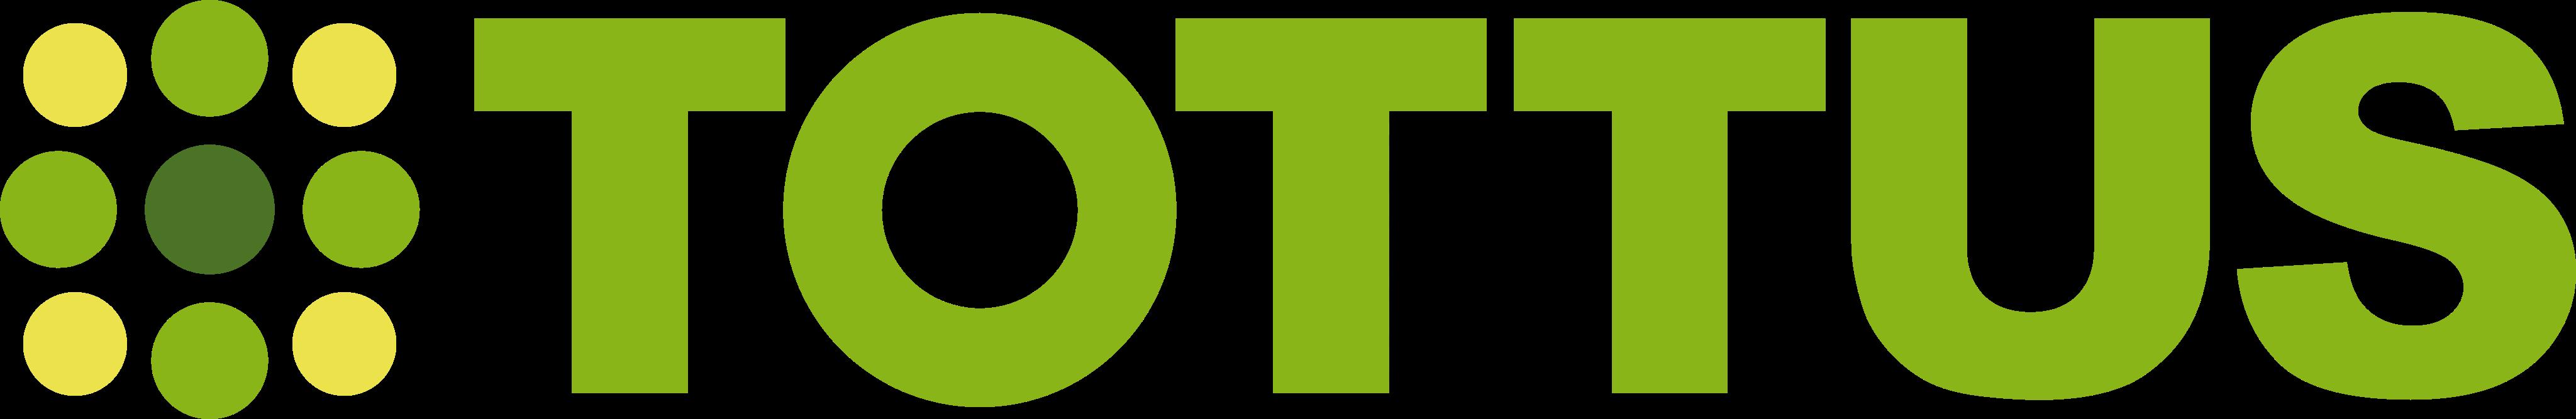 TOTTUS Logo.